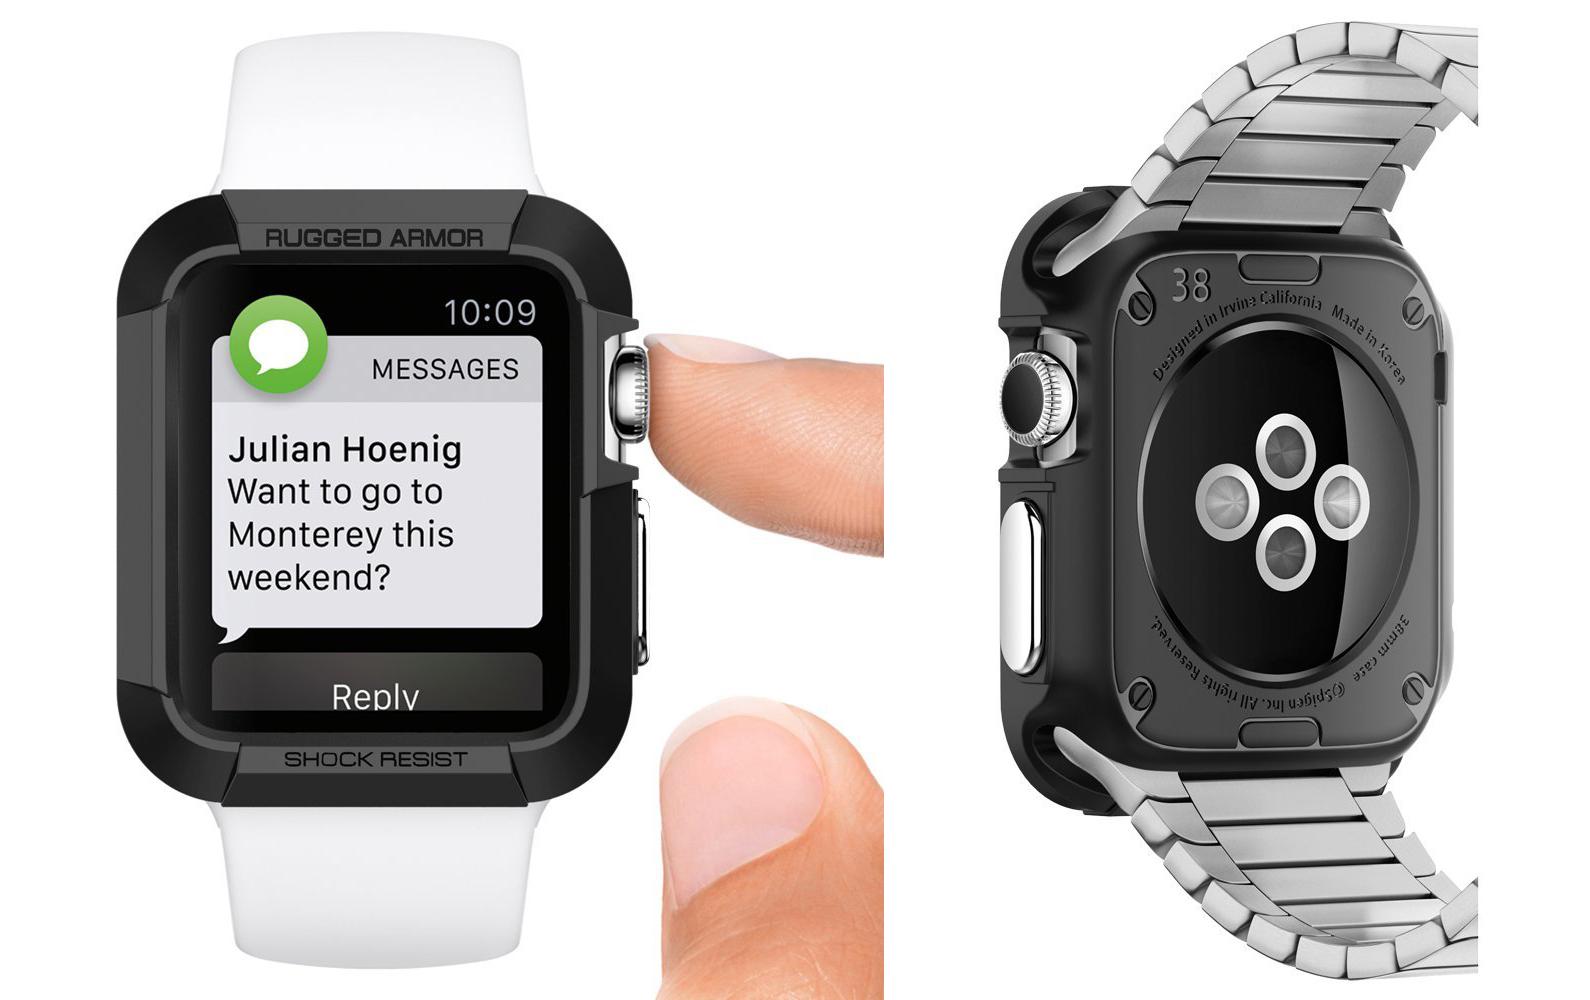 spigen-rugged-armor-apple-watch-case.jpg